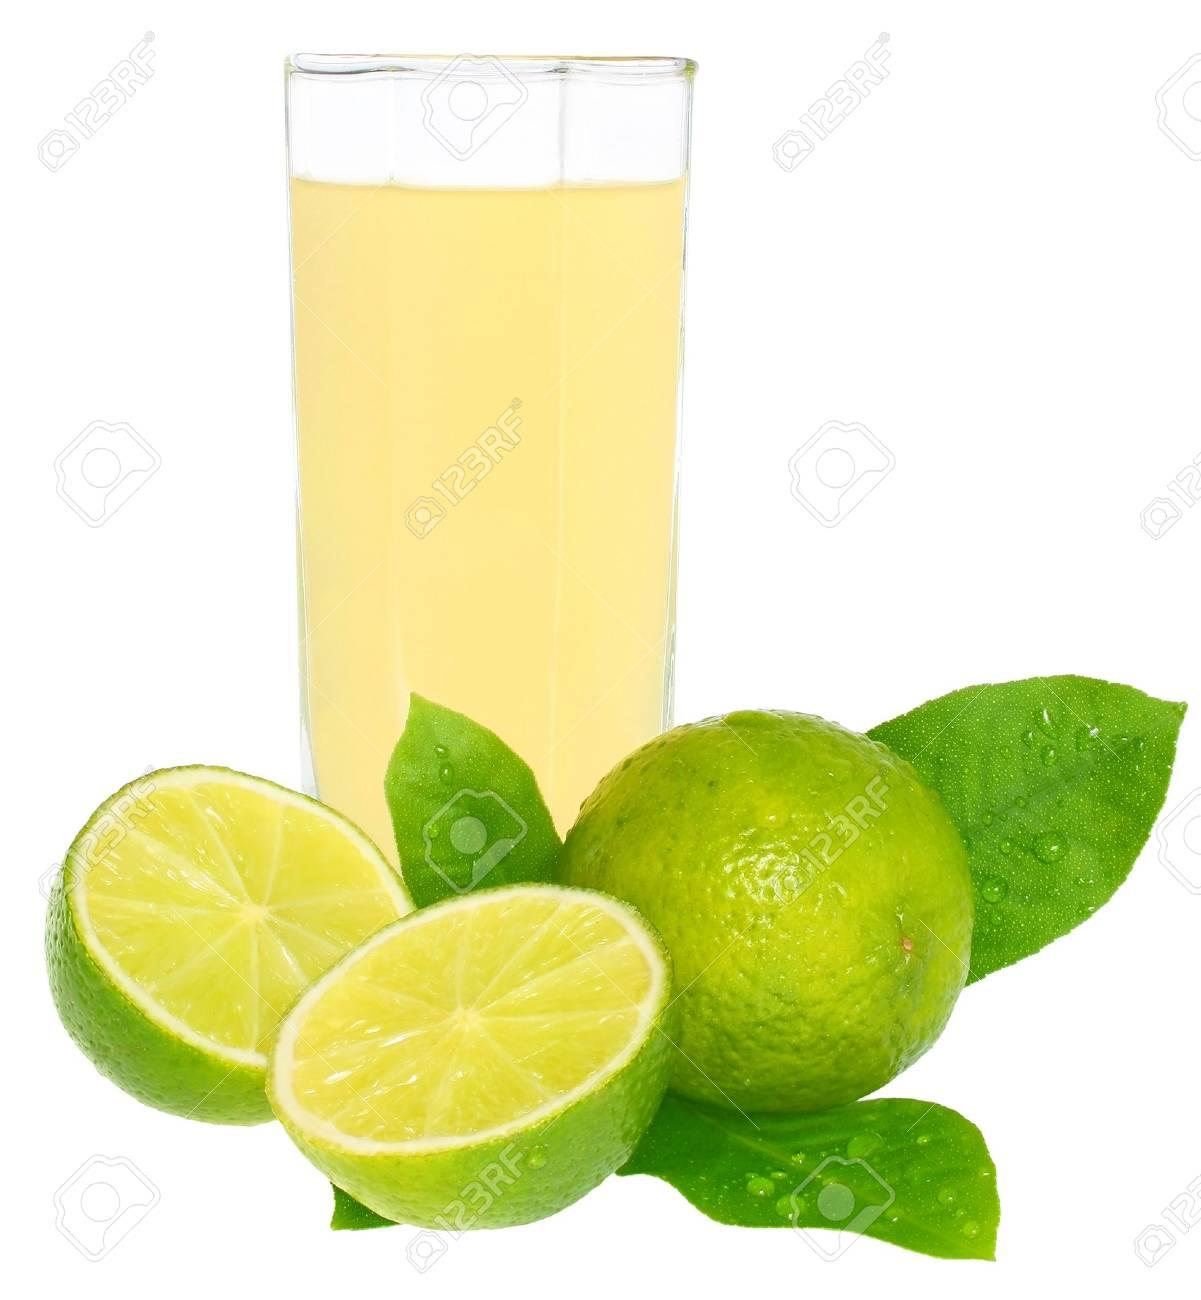 Glass of a lemon juice on a white background. Stock Photo - 10037243